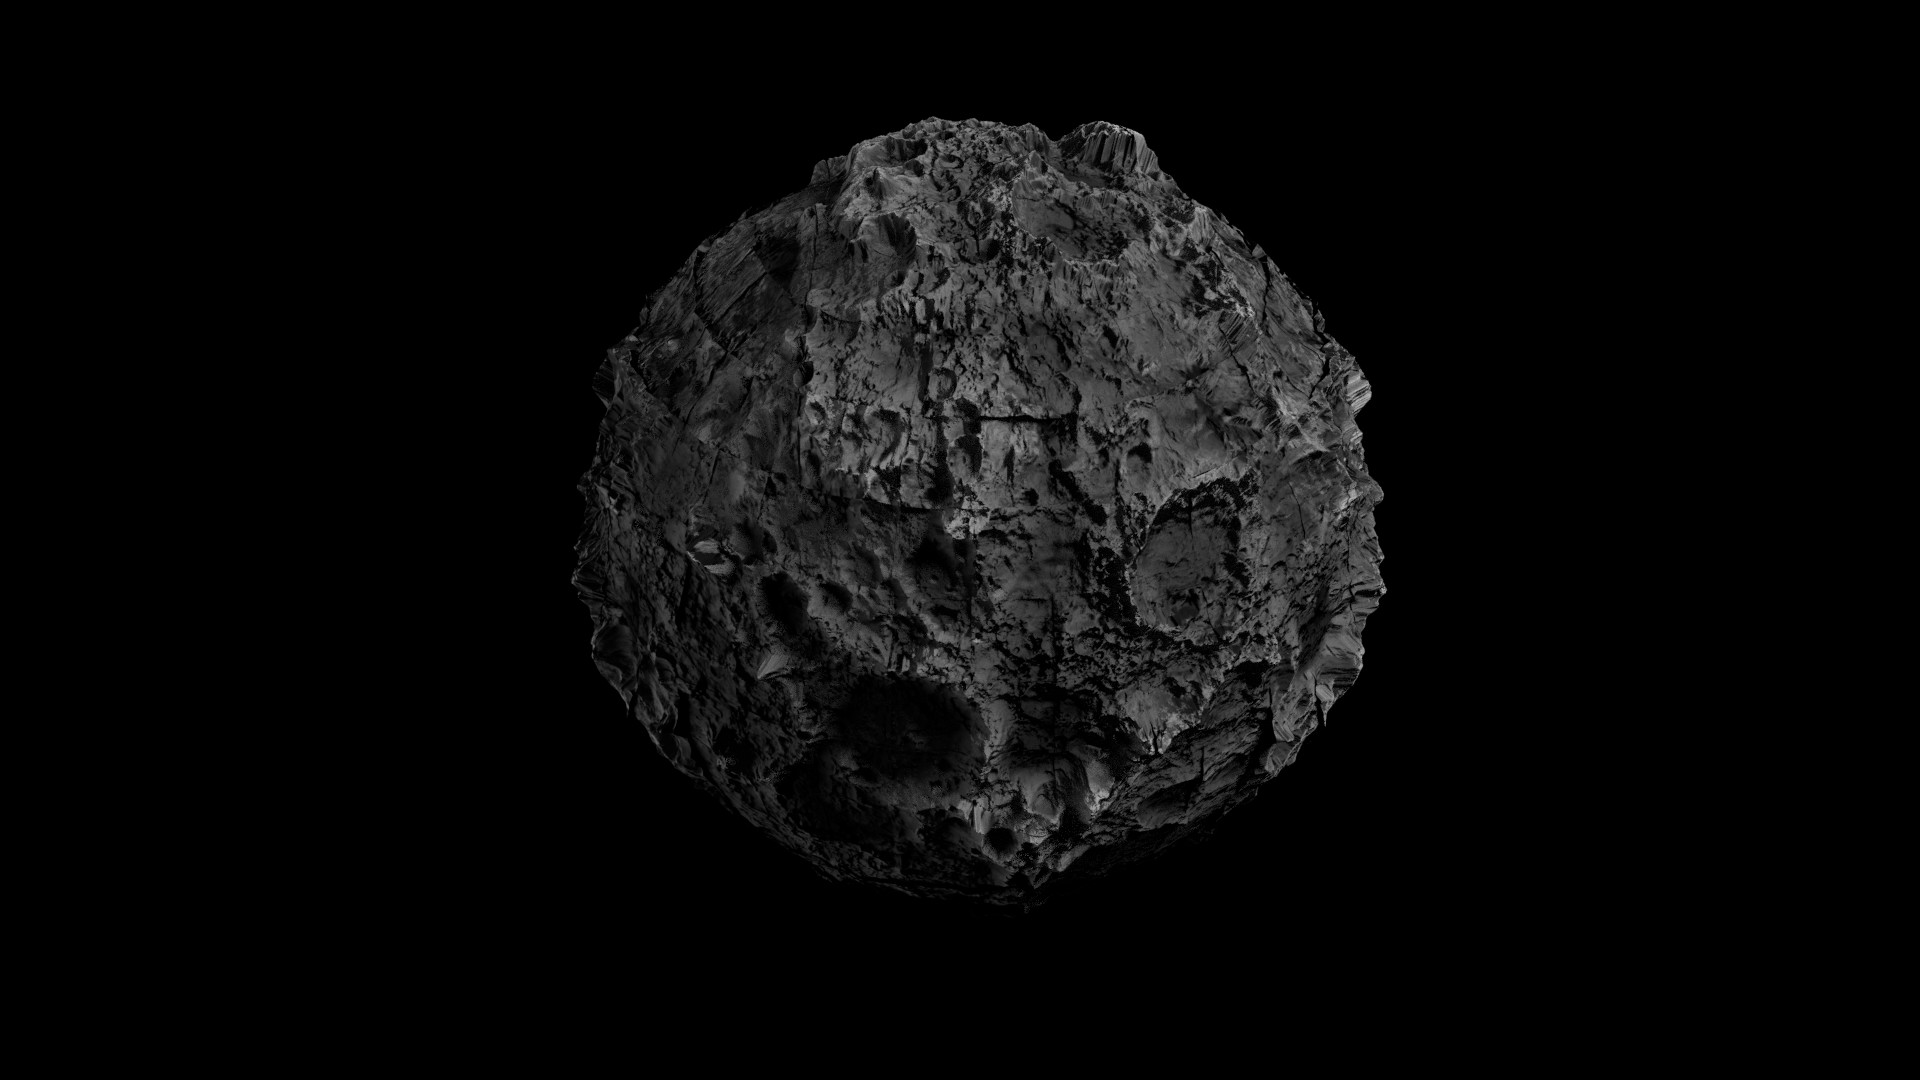 Darryl dias meteoroid v2